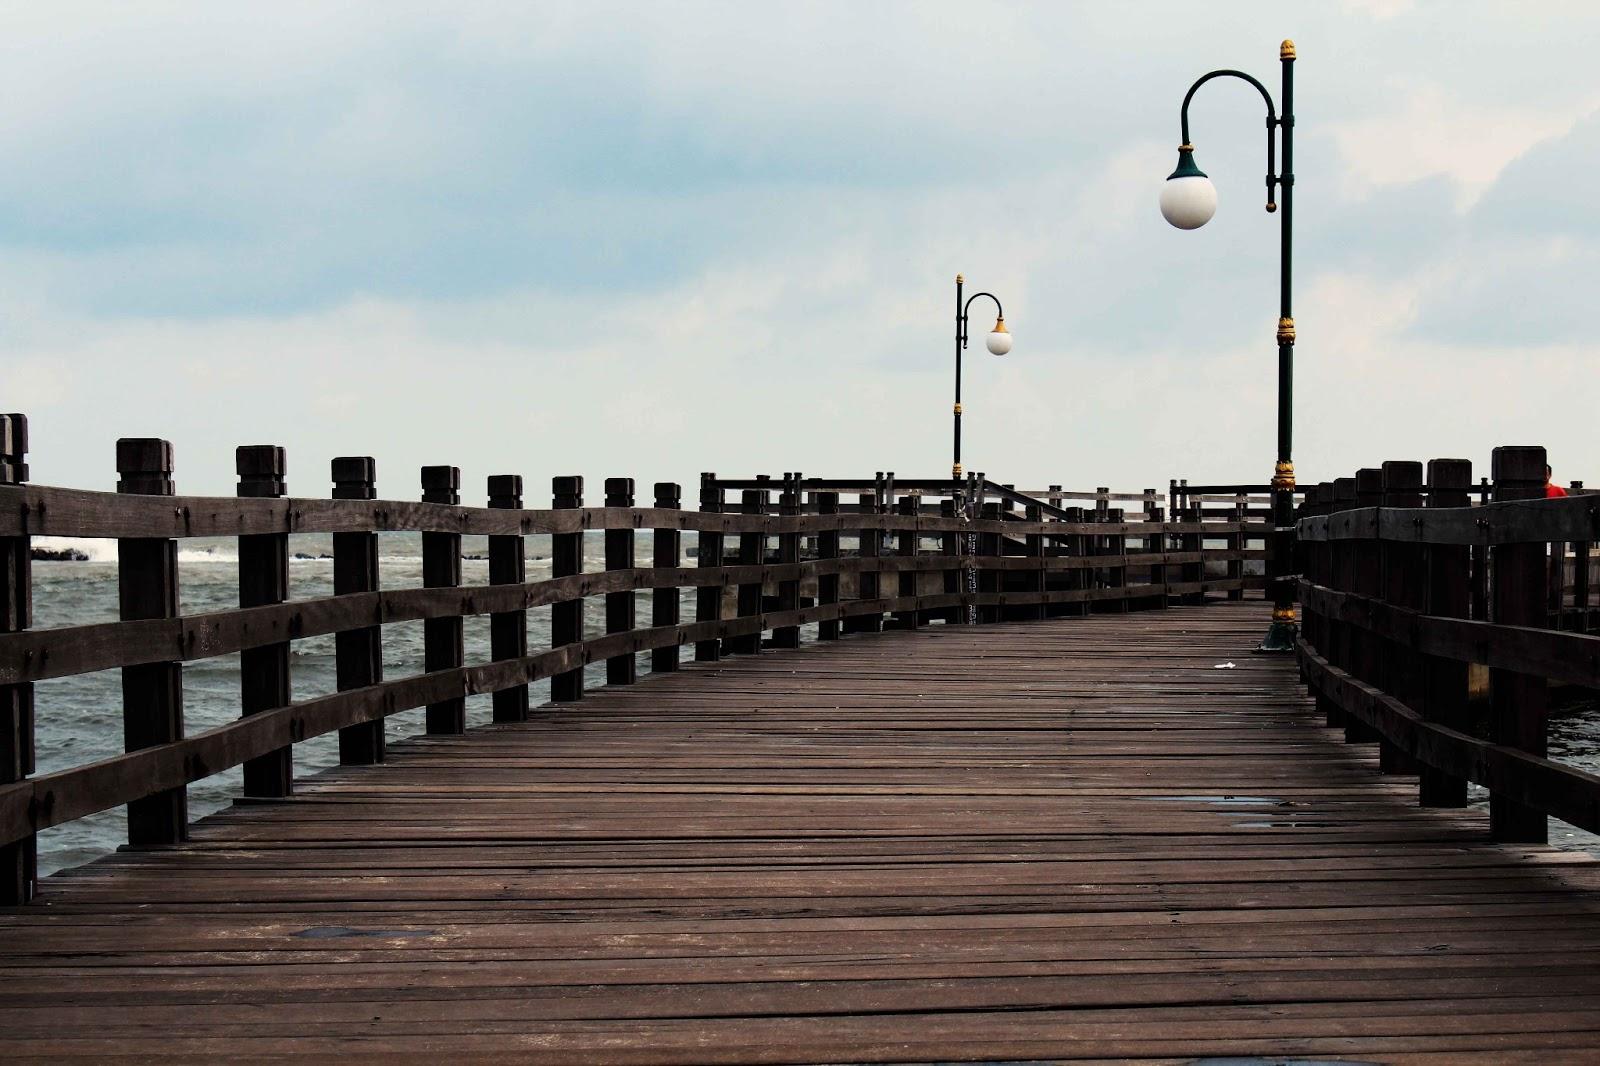 Le Bridge Moyomoto